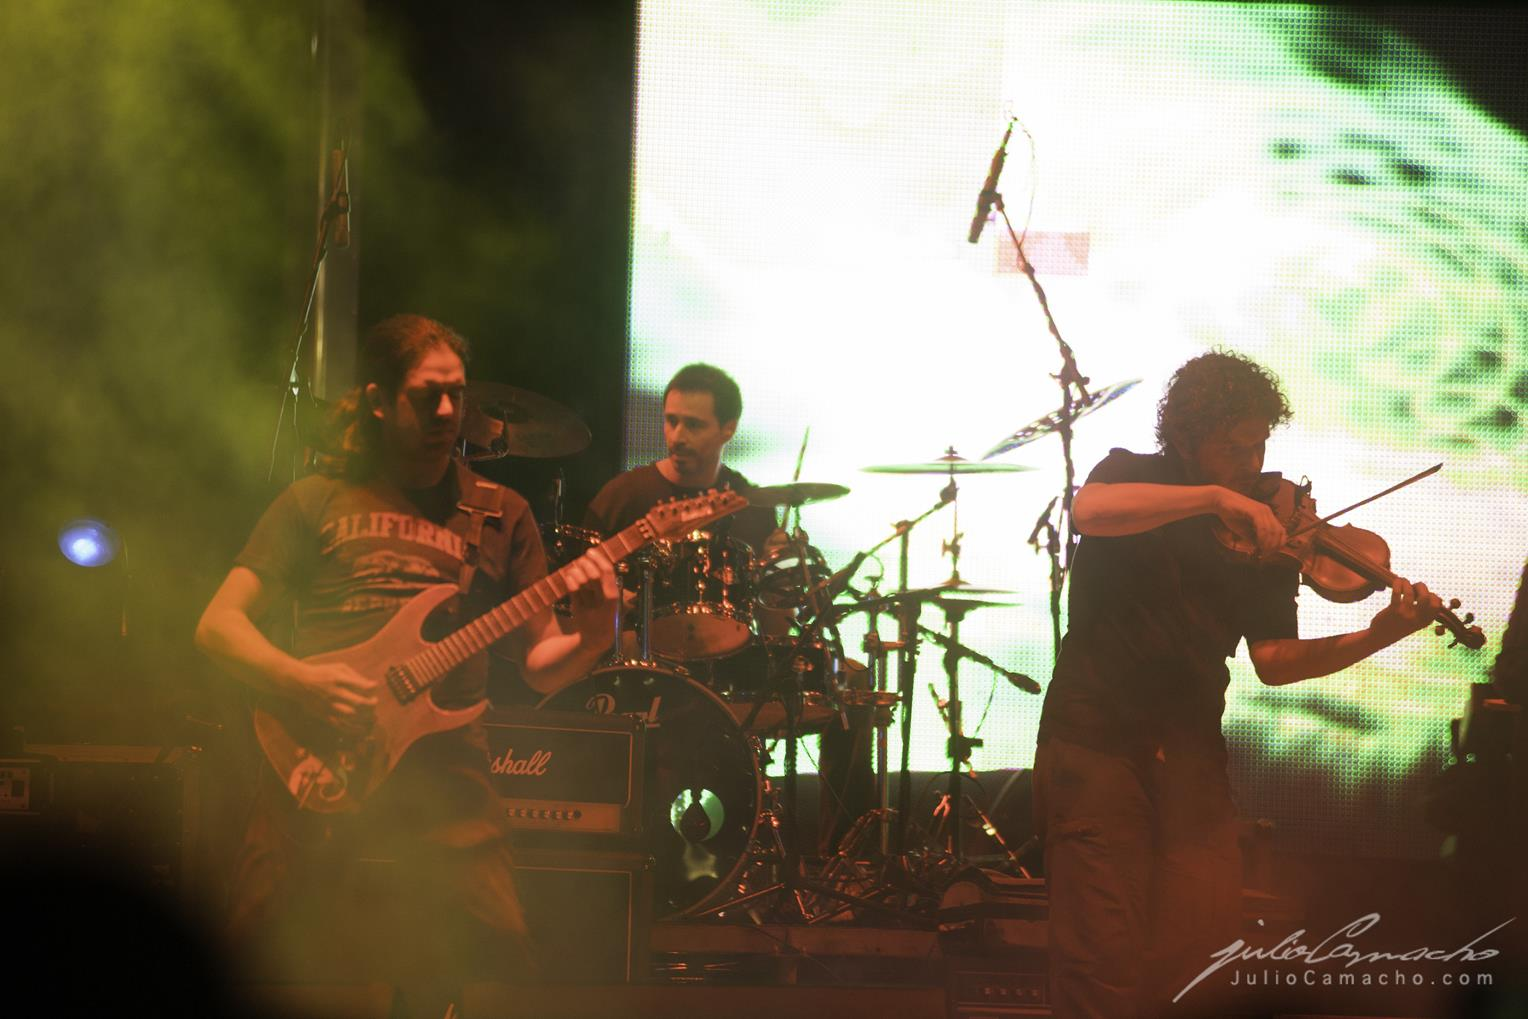 2014-10-30 31 CAST TOUR Ensenada y Tijuana - 1414 - www.Juli (Copy).jpg